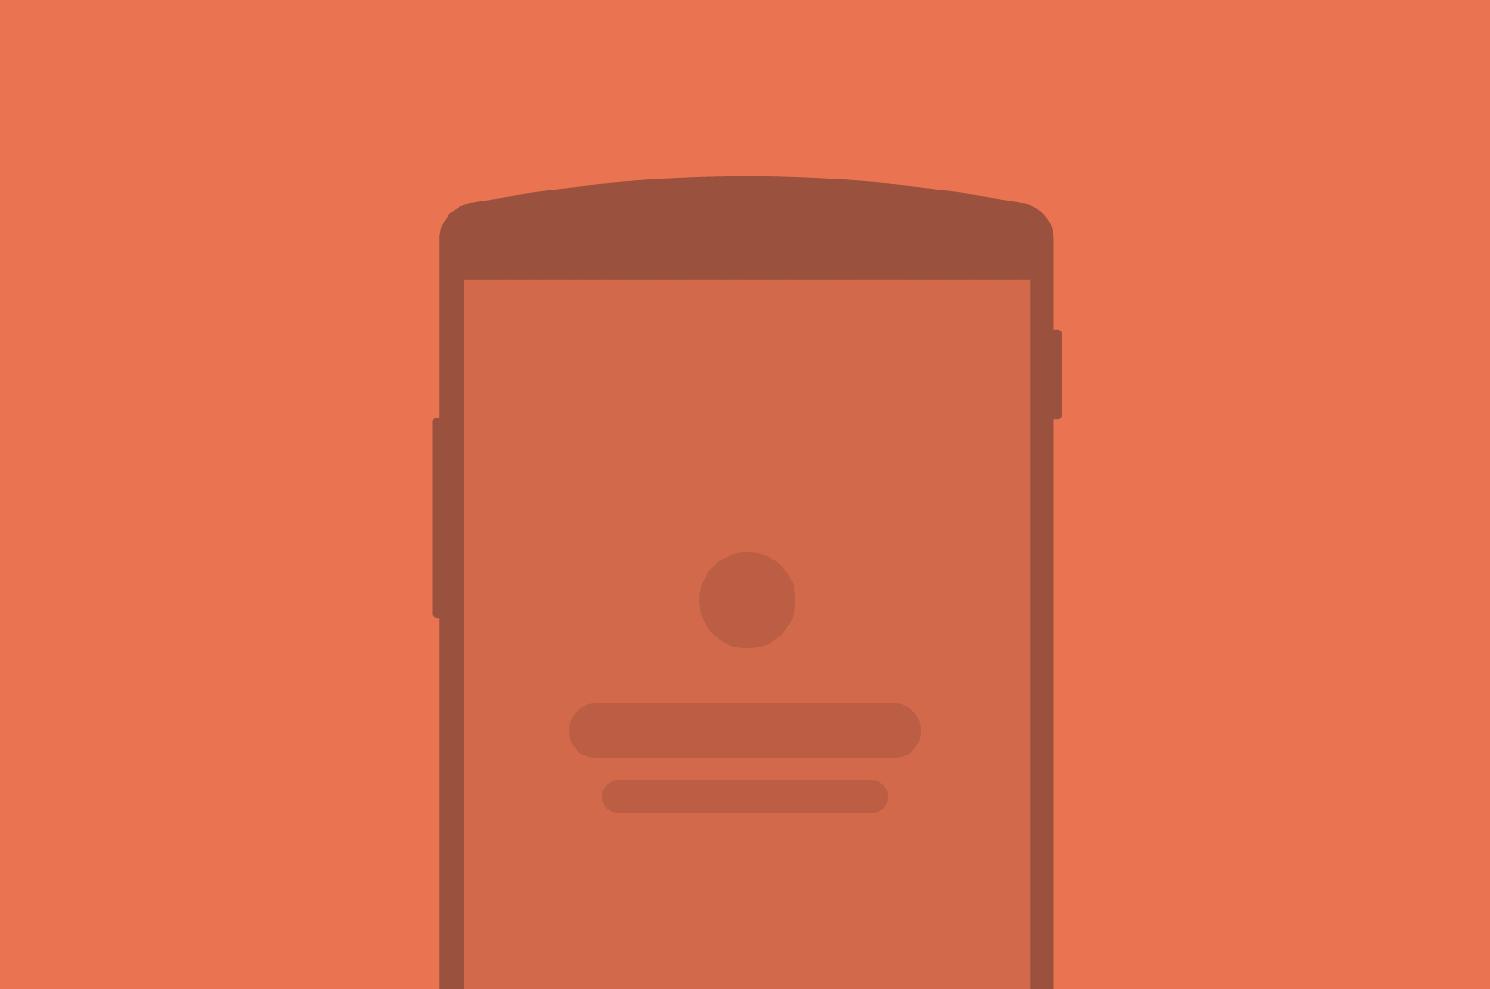 Make an Android Launch Screen (Splash Screen)